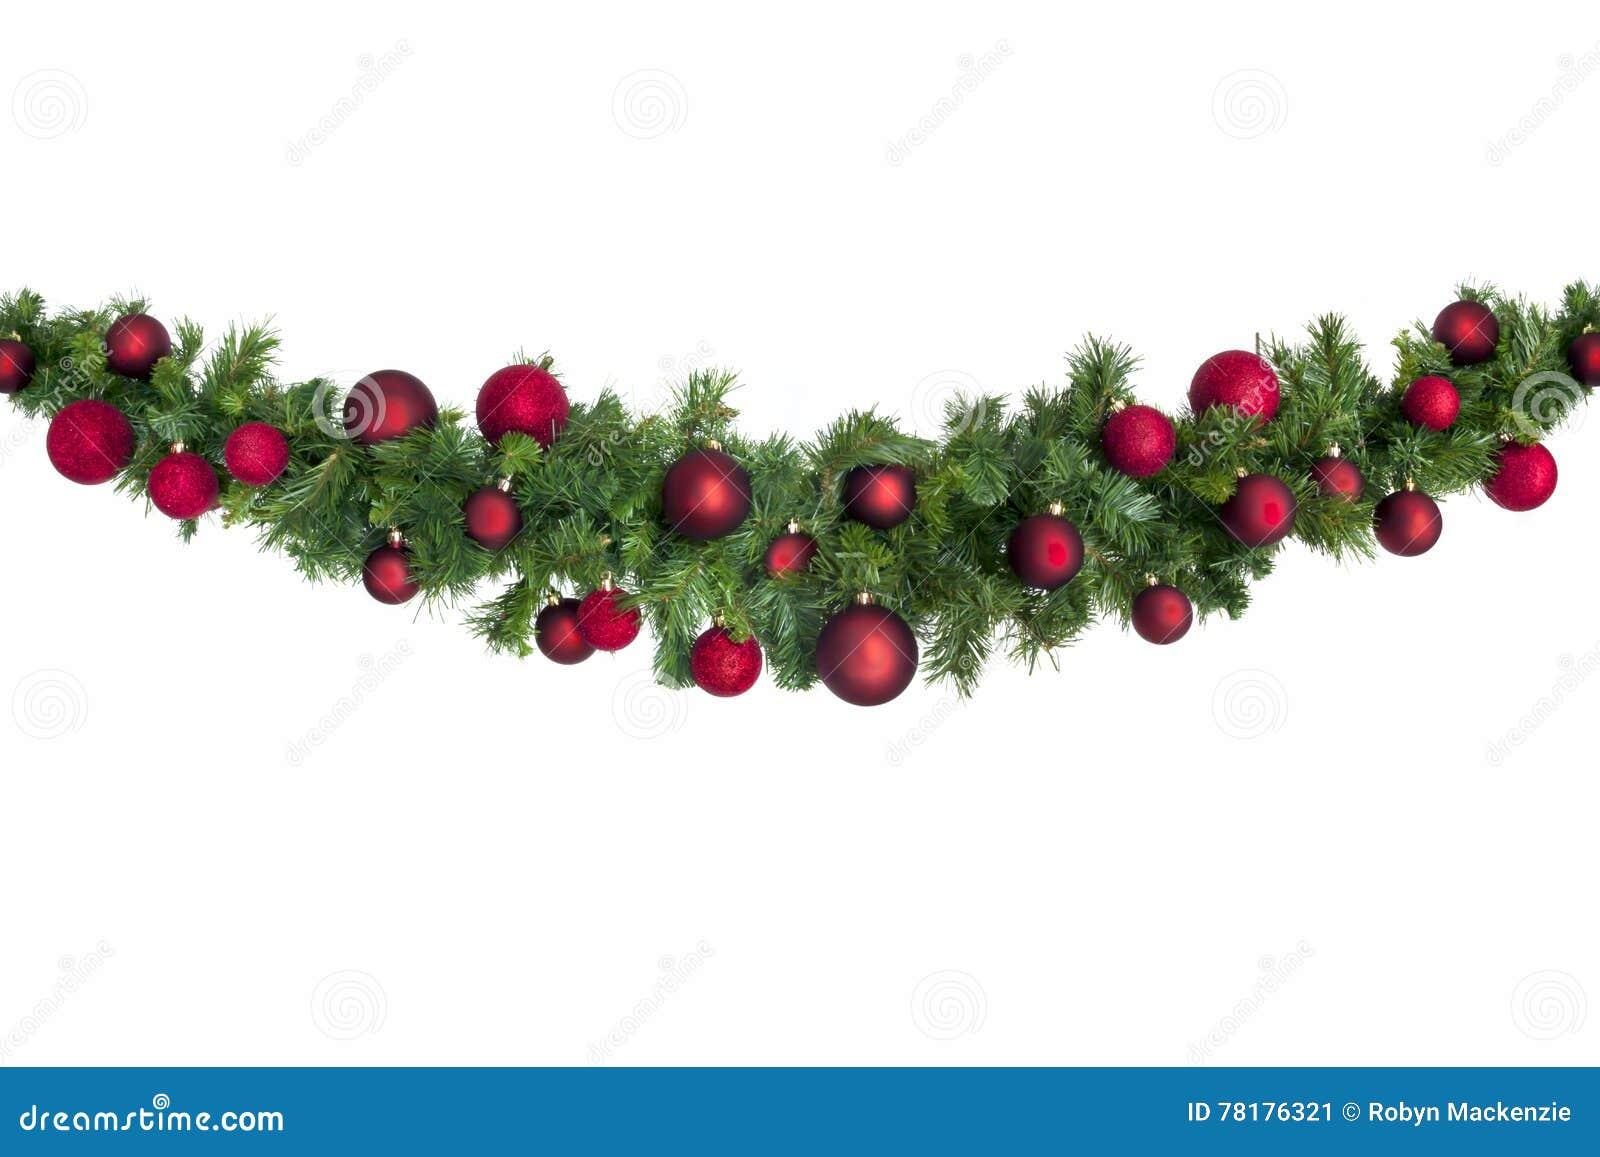 Ghirlanda di Natale con le bagattelle rosse